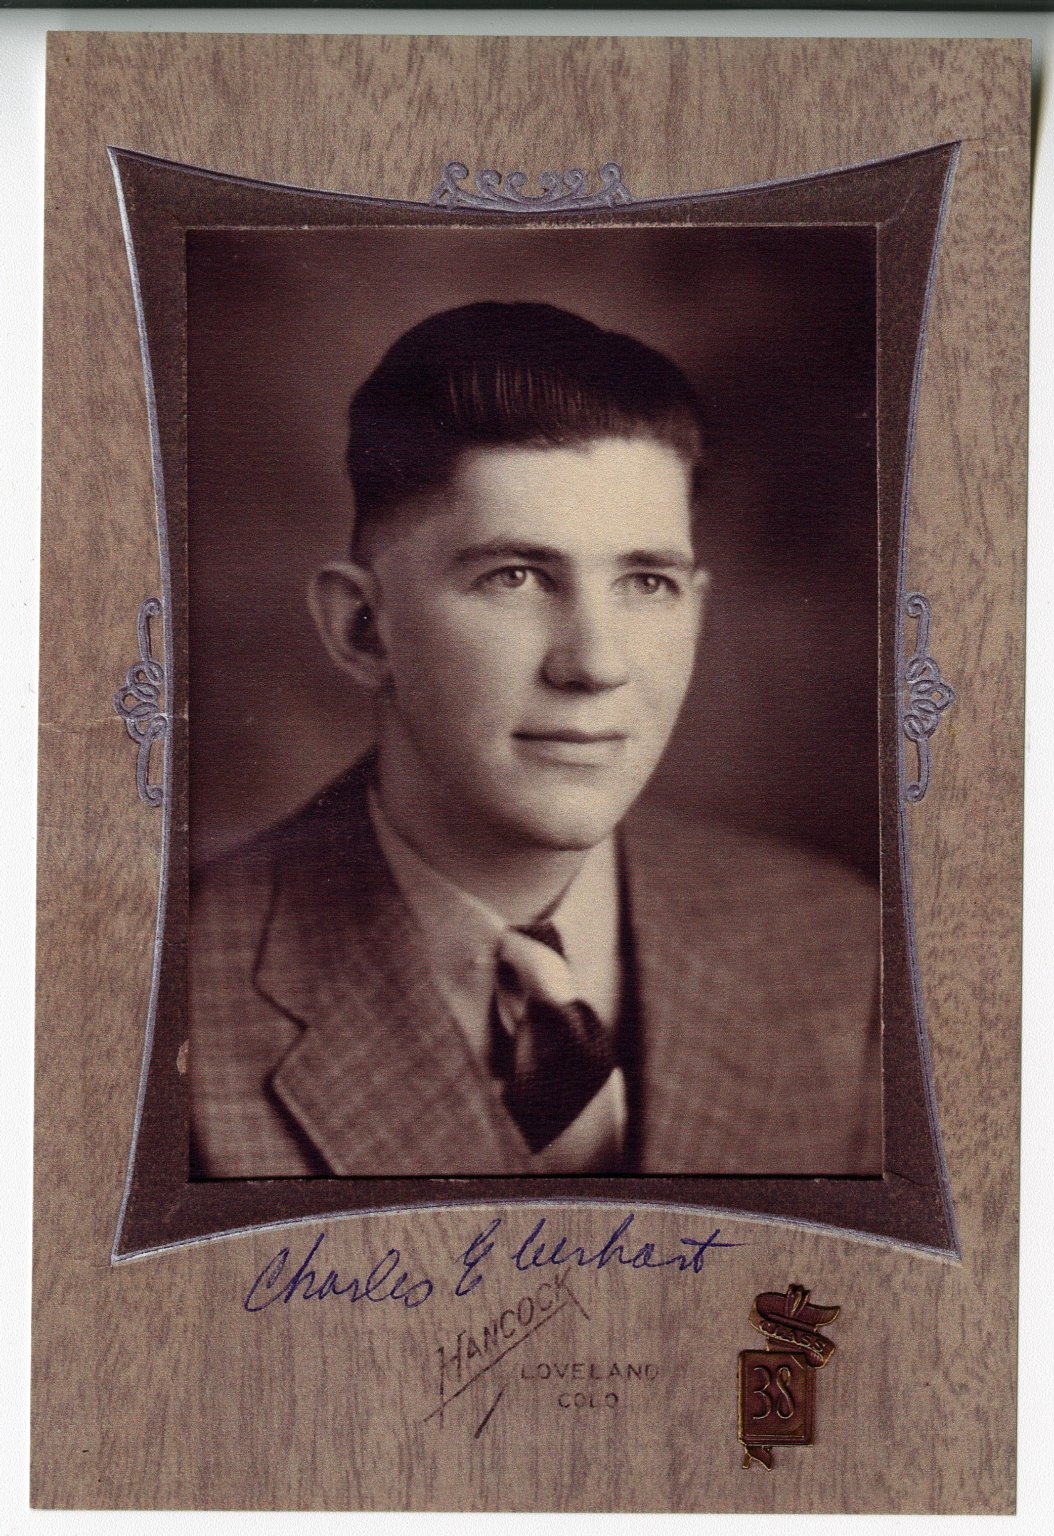 Charles Eberhart